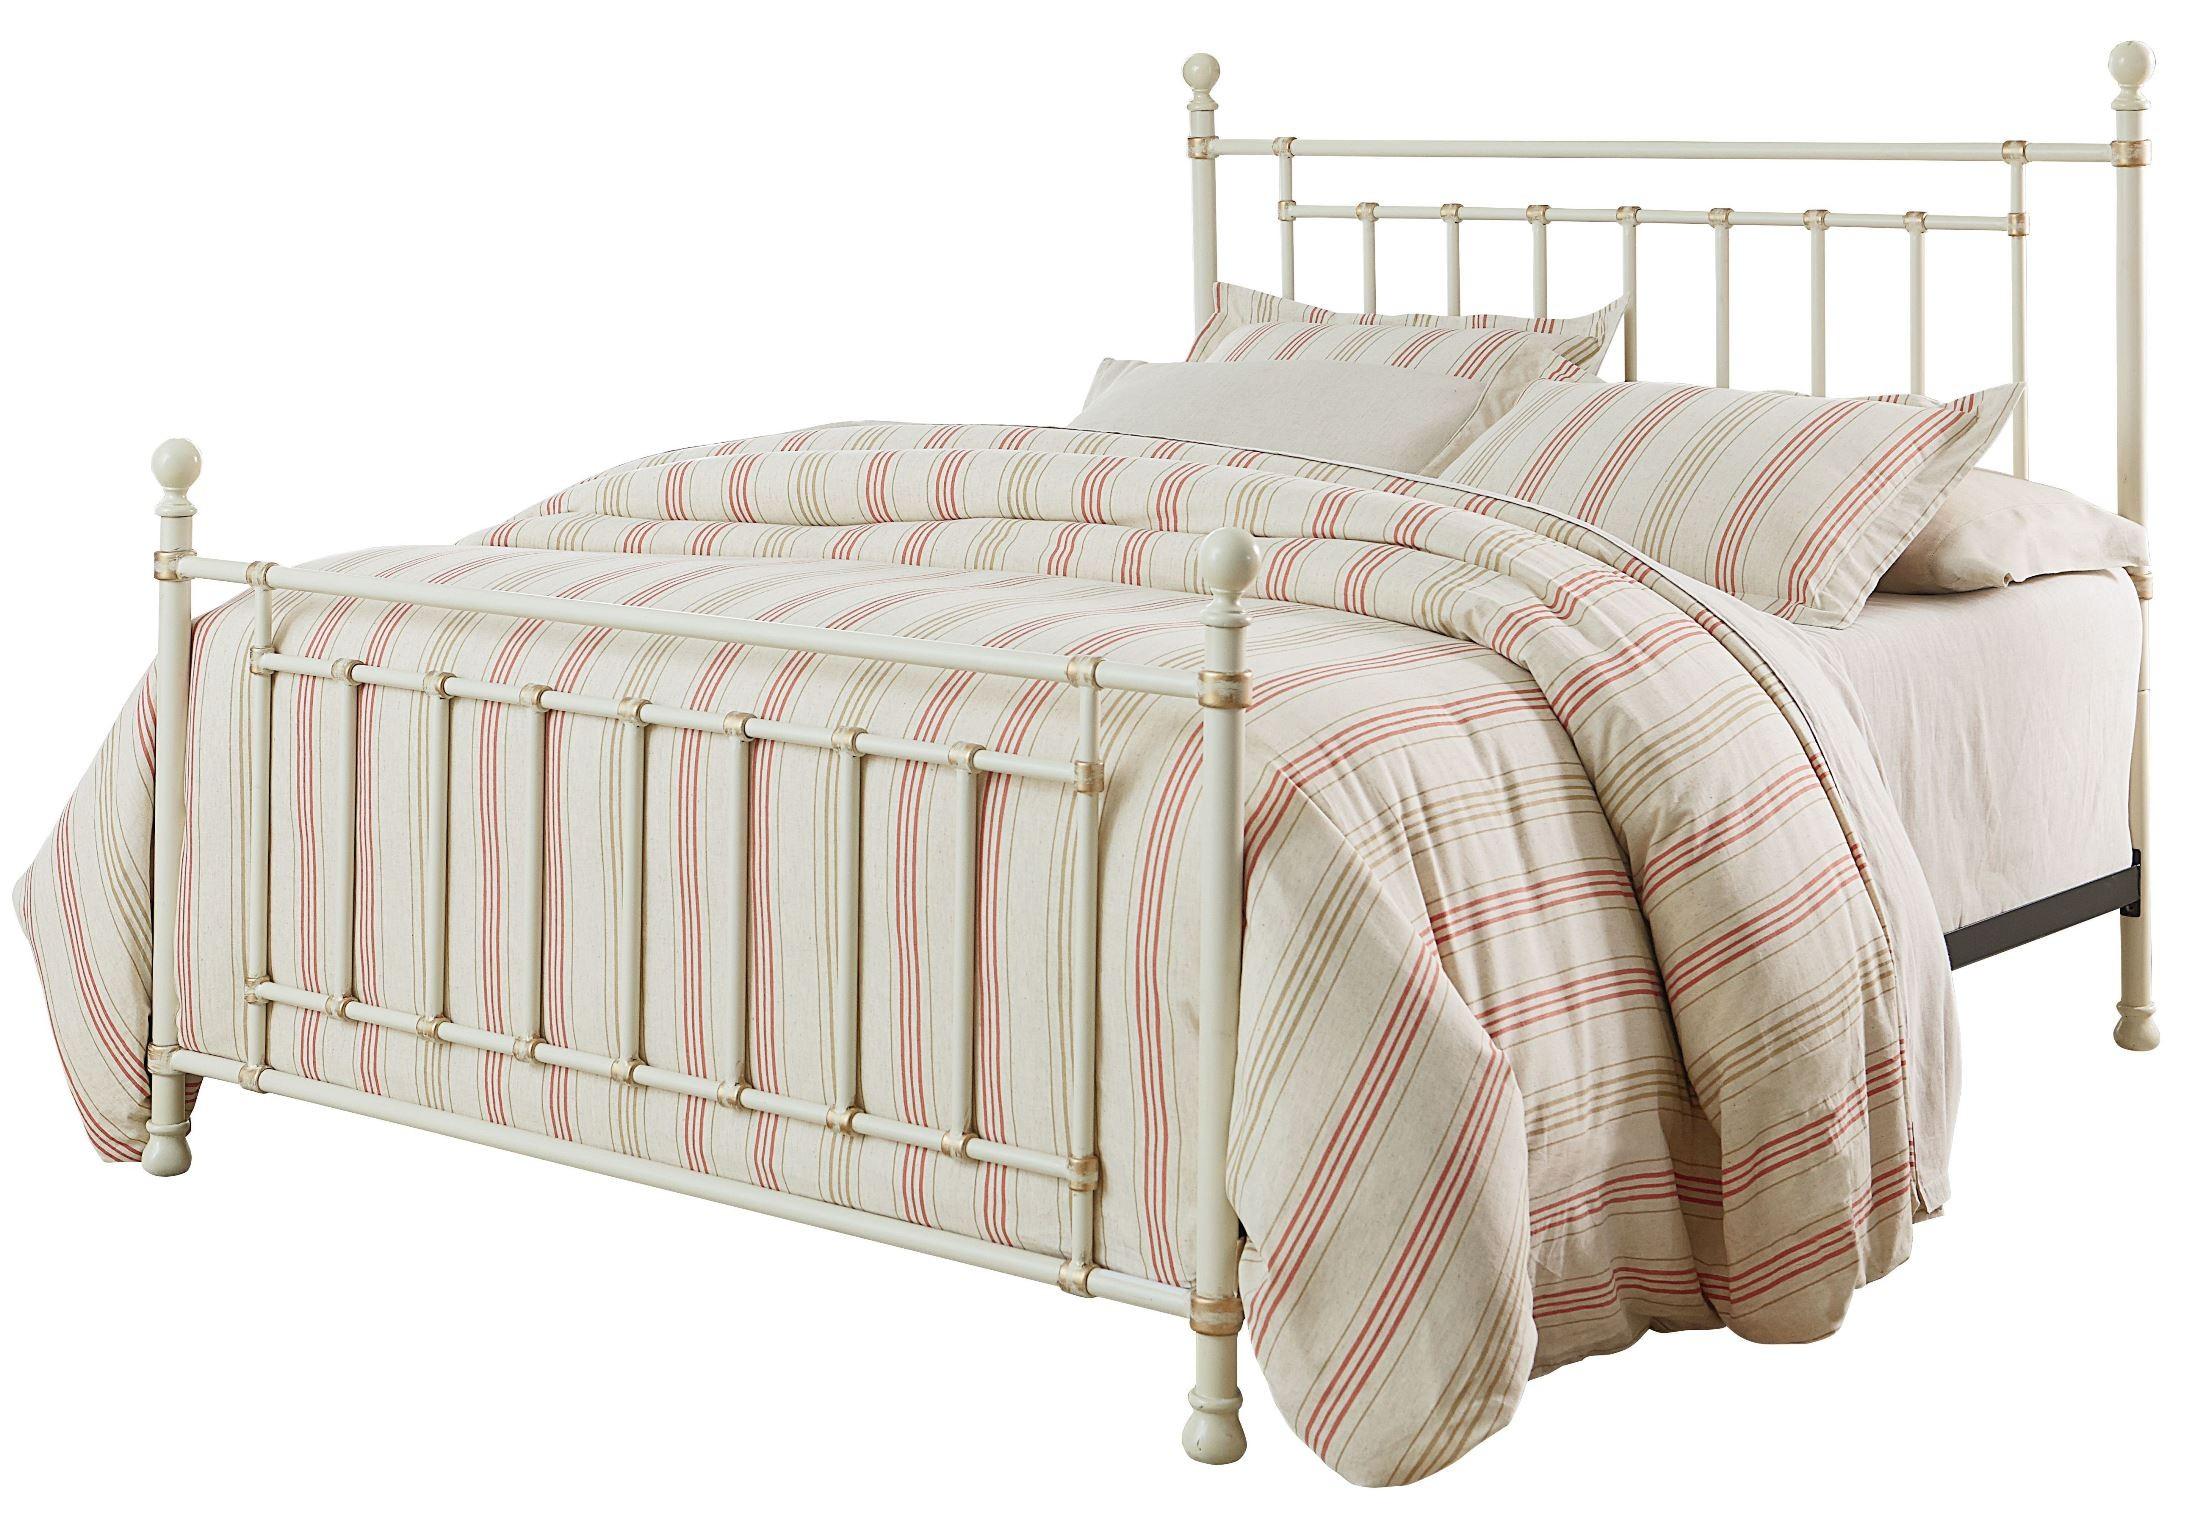 White Metal Bed Queen: Bennington White Queen Metal Bed From Standard Furniture